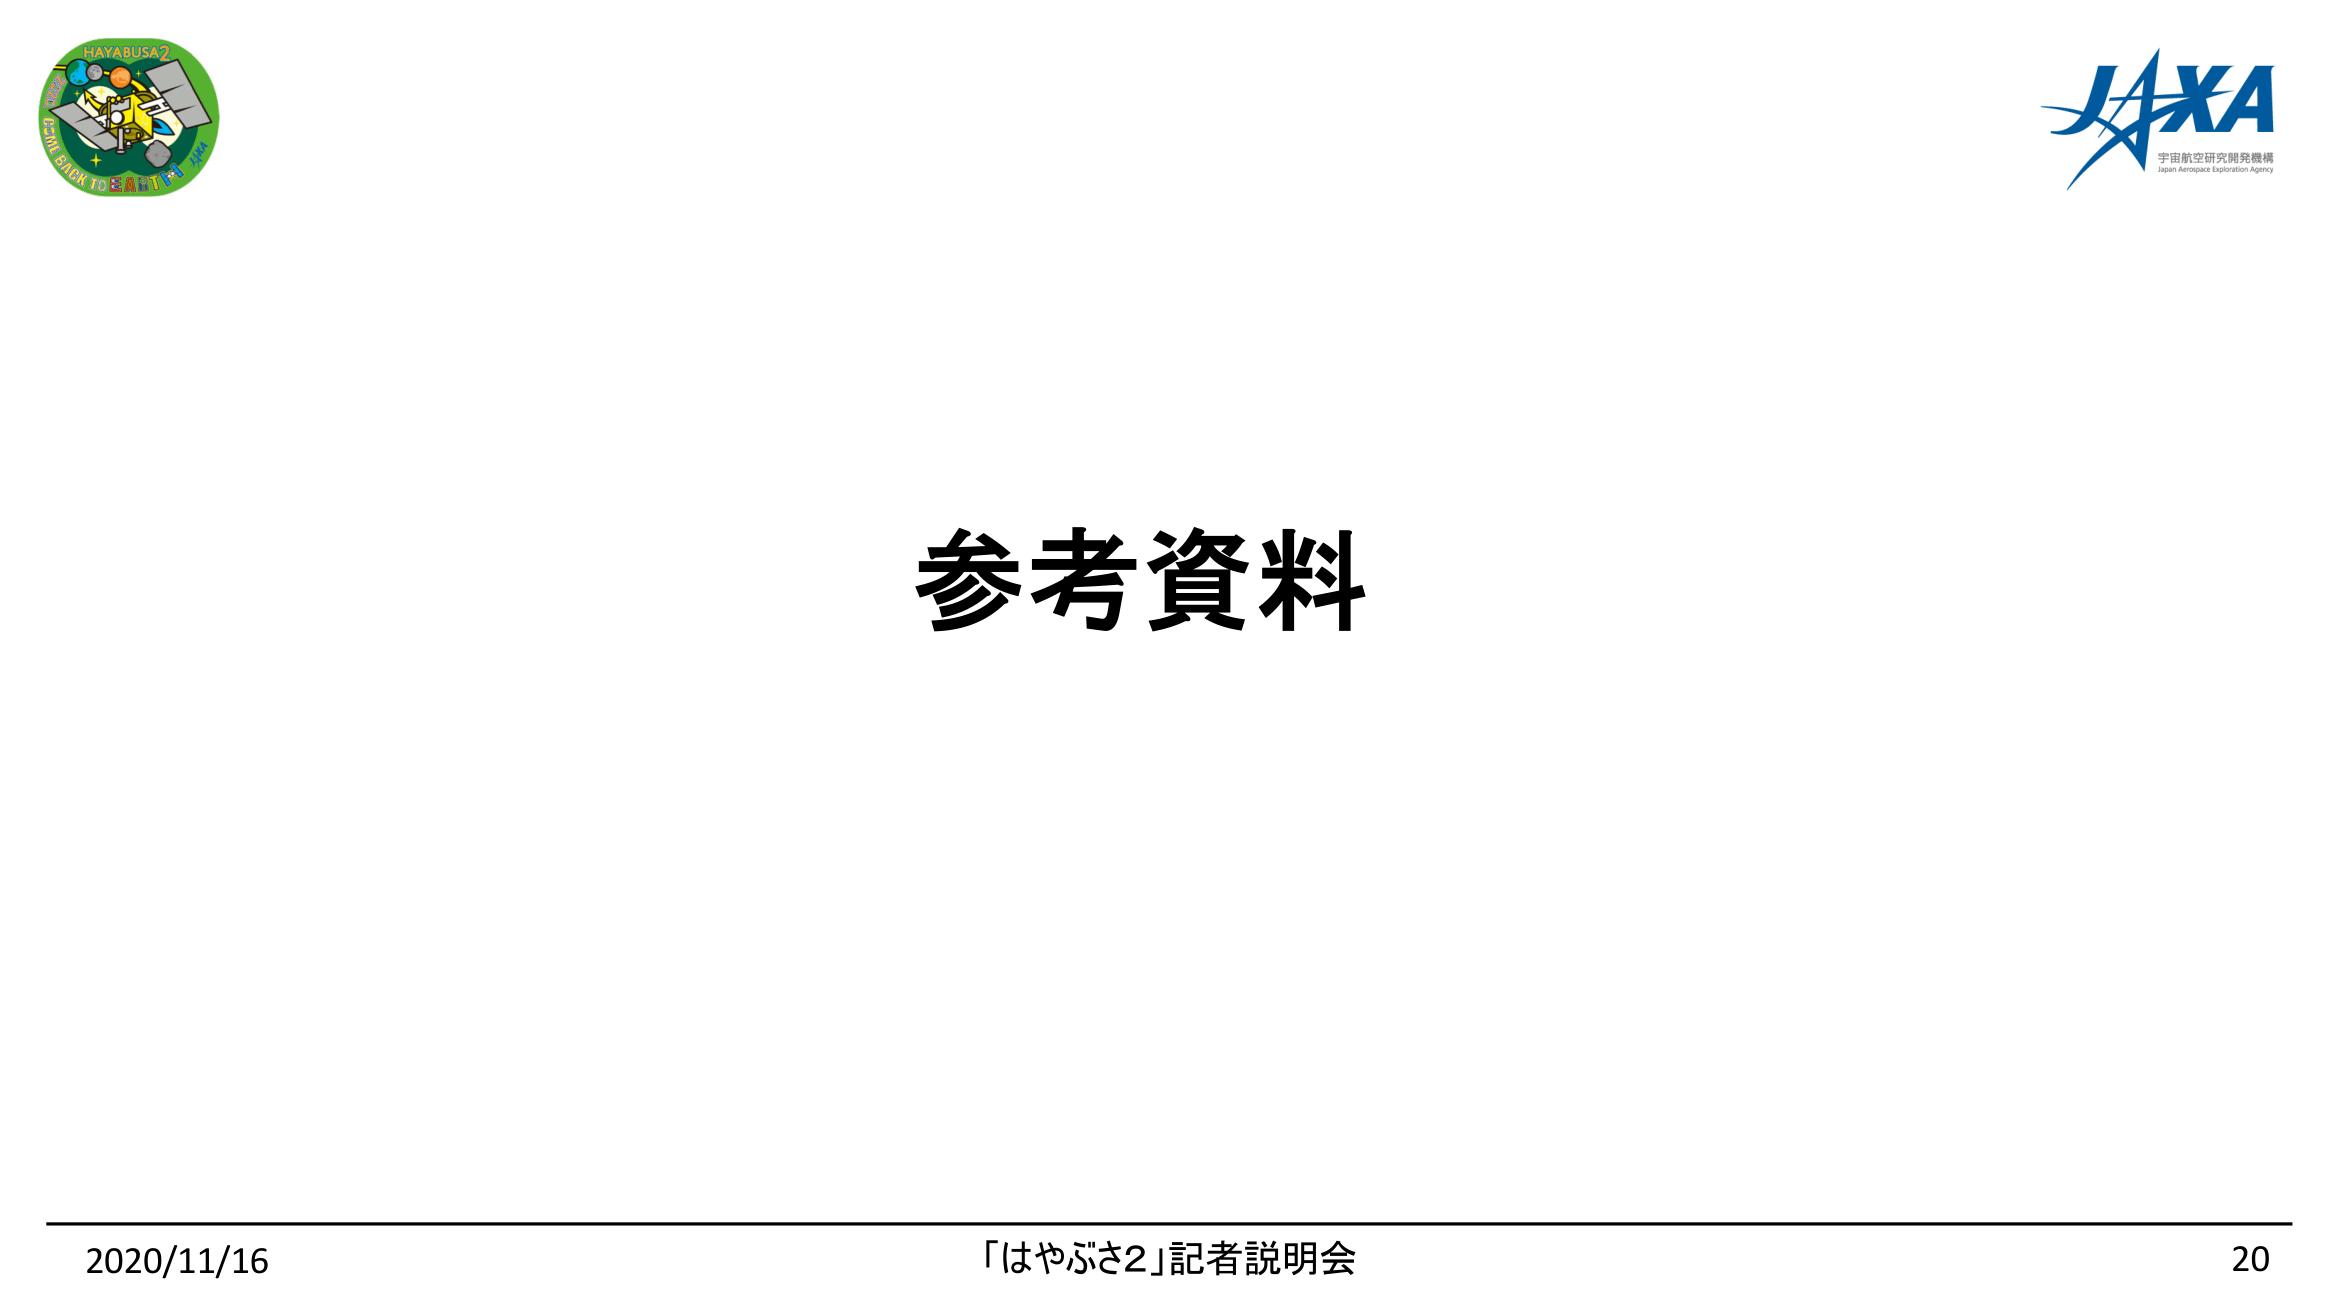 f:id:Imamura:20201116151343p:plain